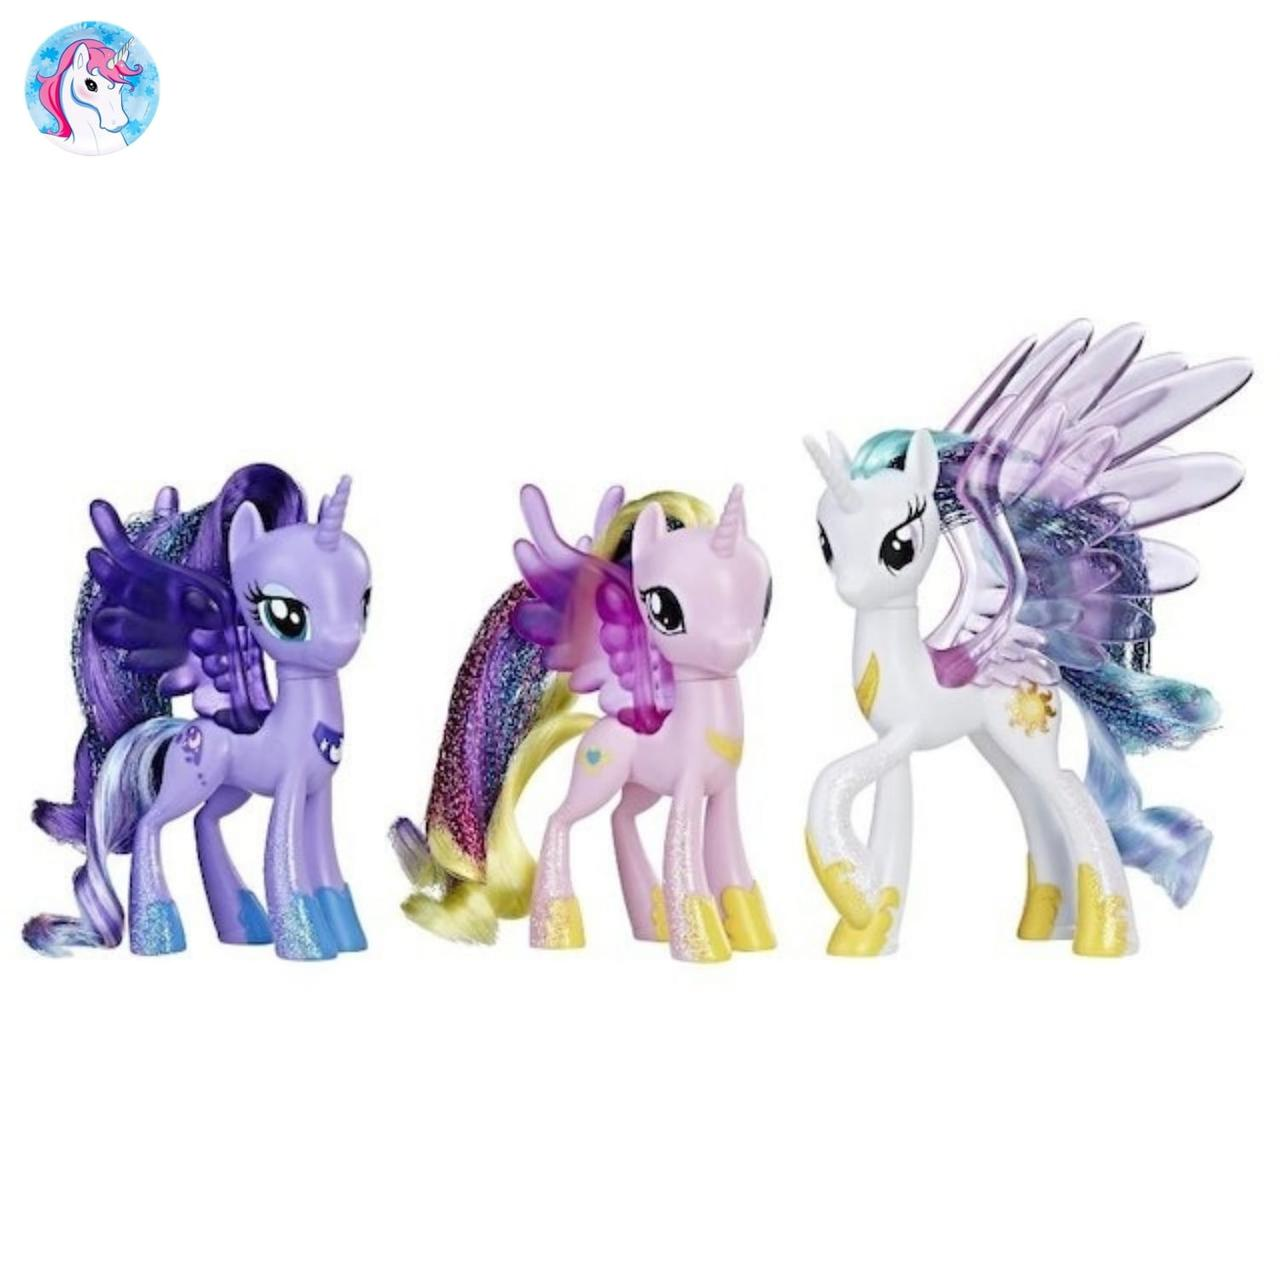 My Little Pony Эксклюзивный набор пони парад Принцесс Friendship Festival  Princess Parade - Детские игрушки интернет b8f0eb7e866